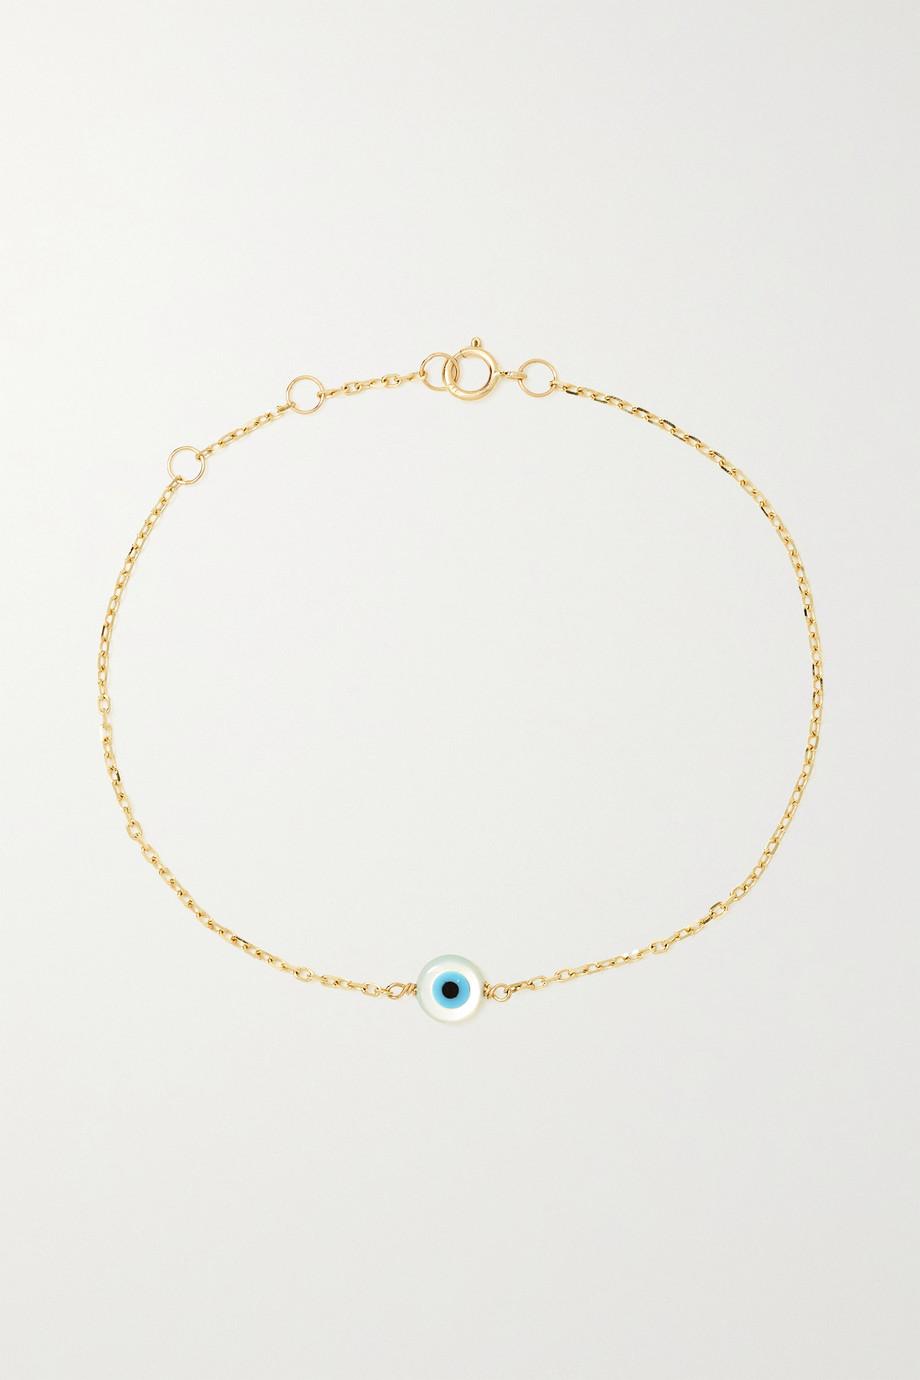 STONE AND STRAND Armband aus Gold mit Perlmutt und Emaille